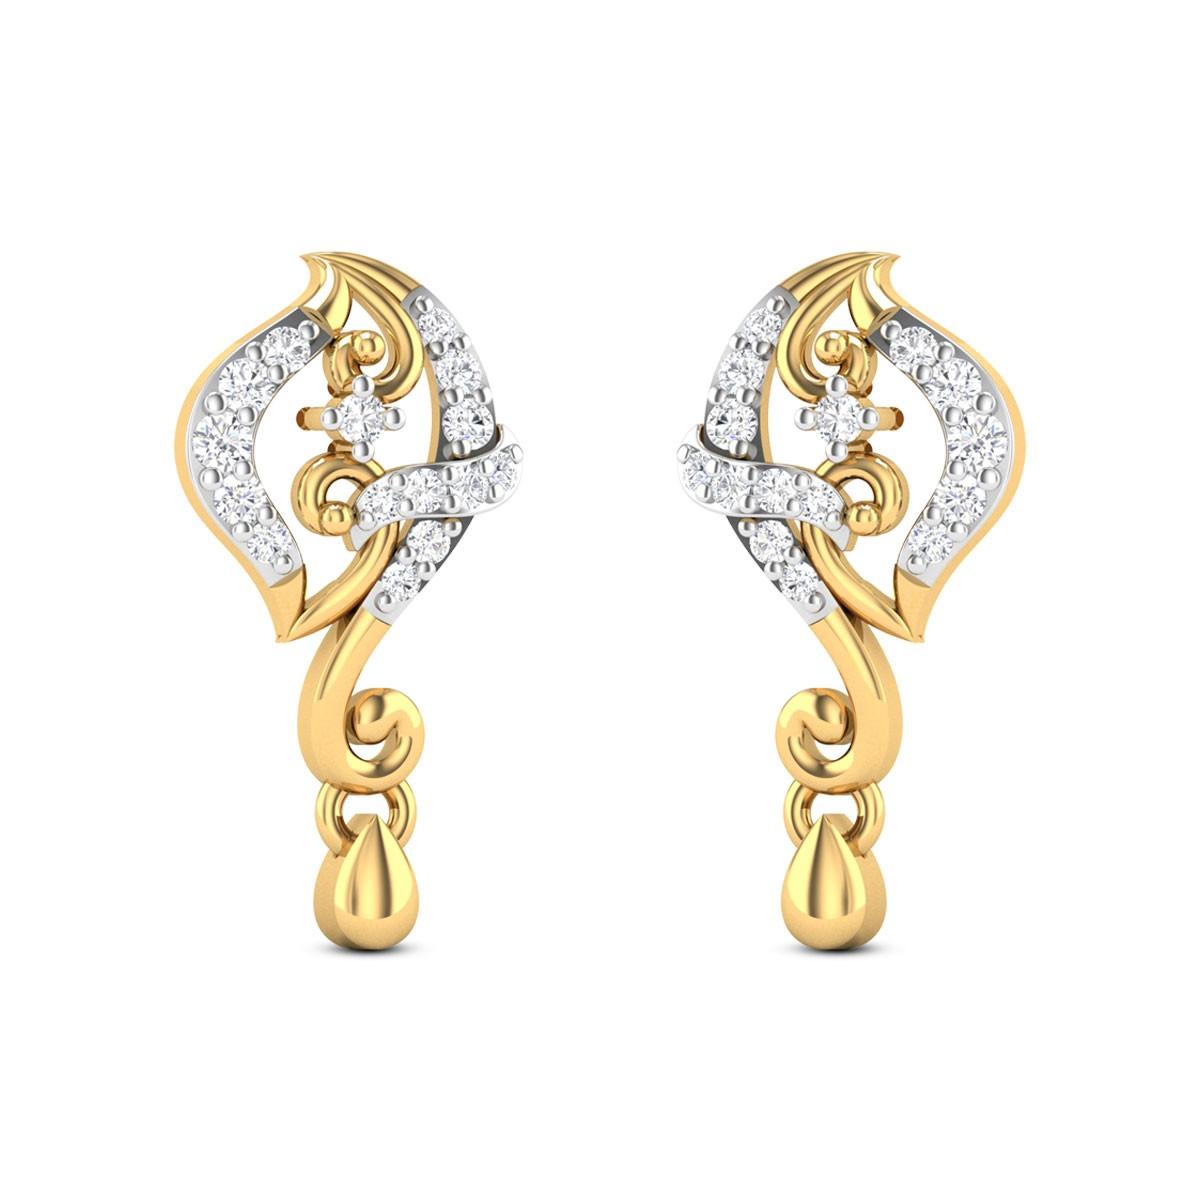 Yagna Diamond Earrings